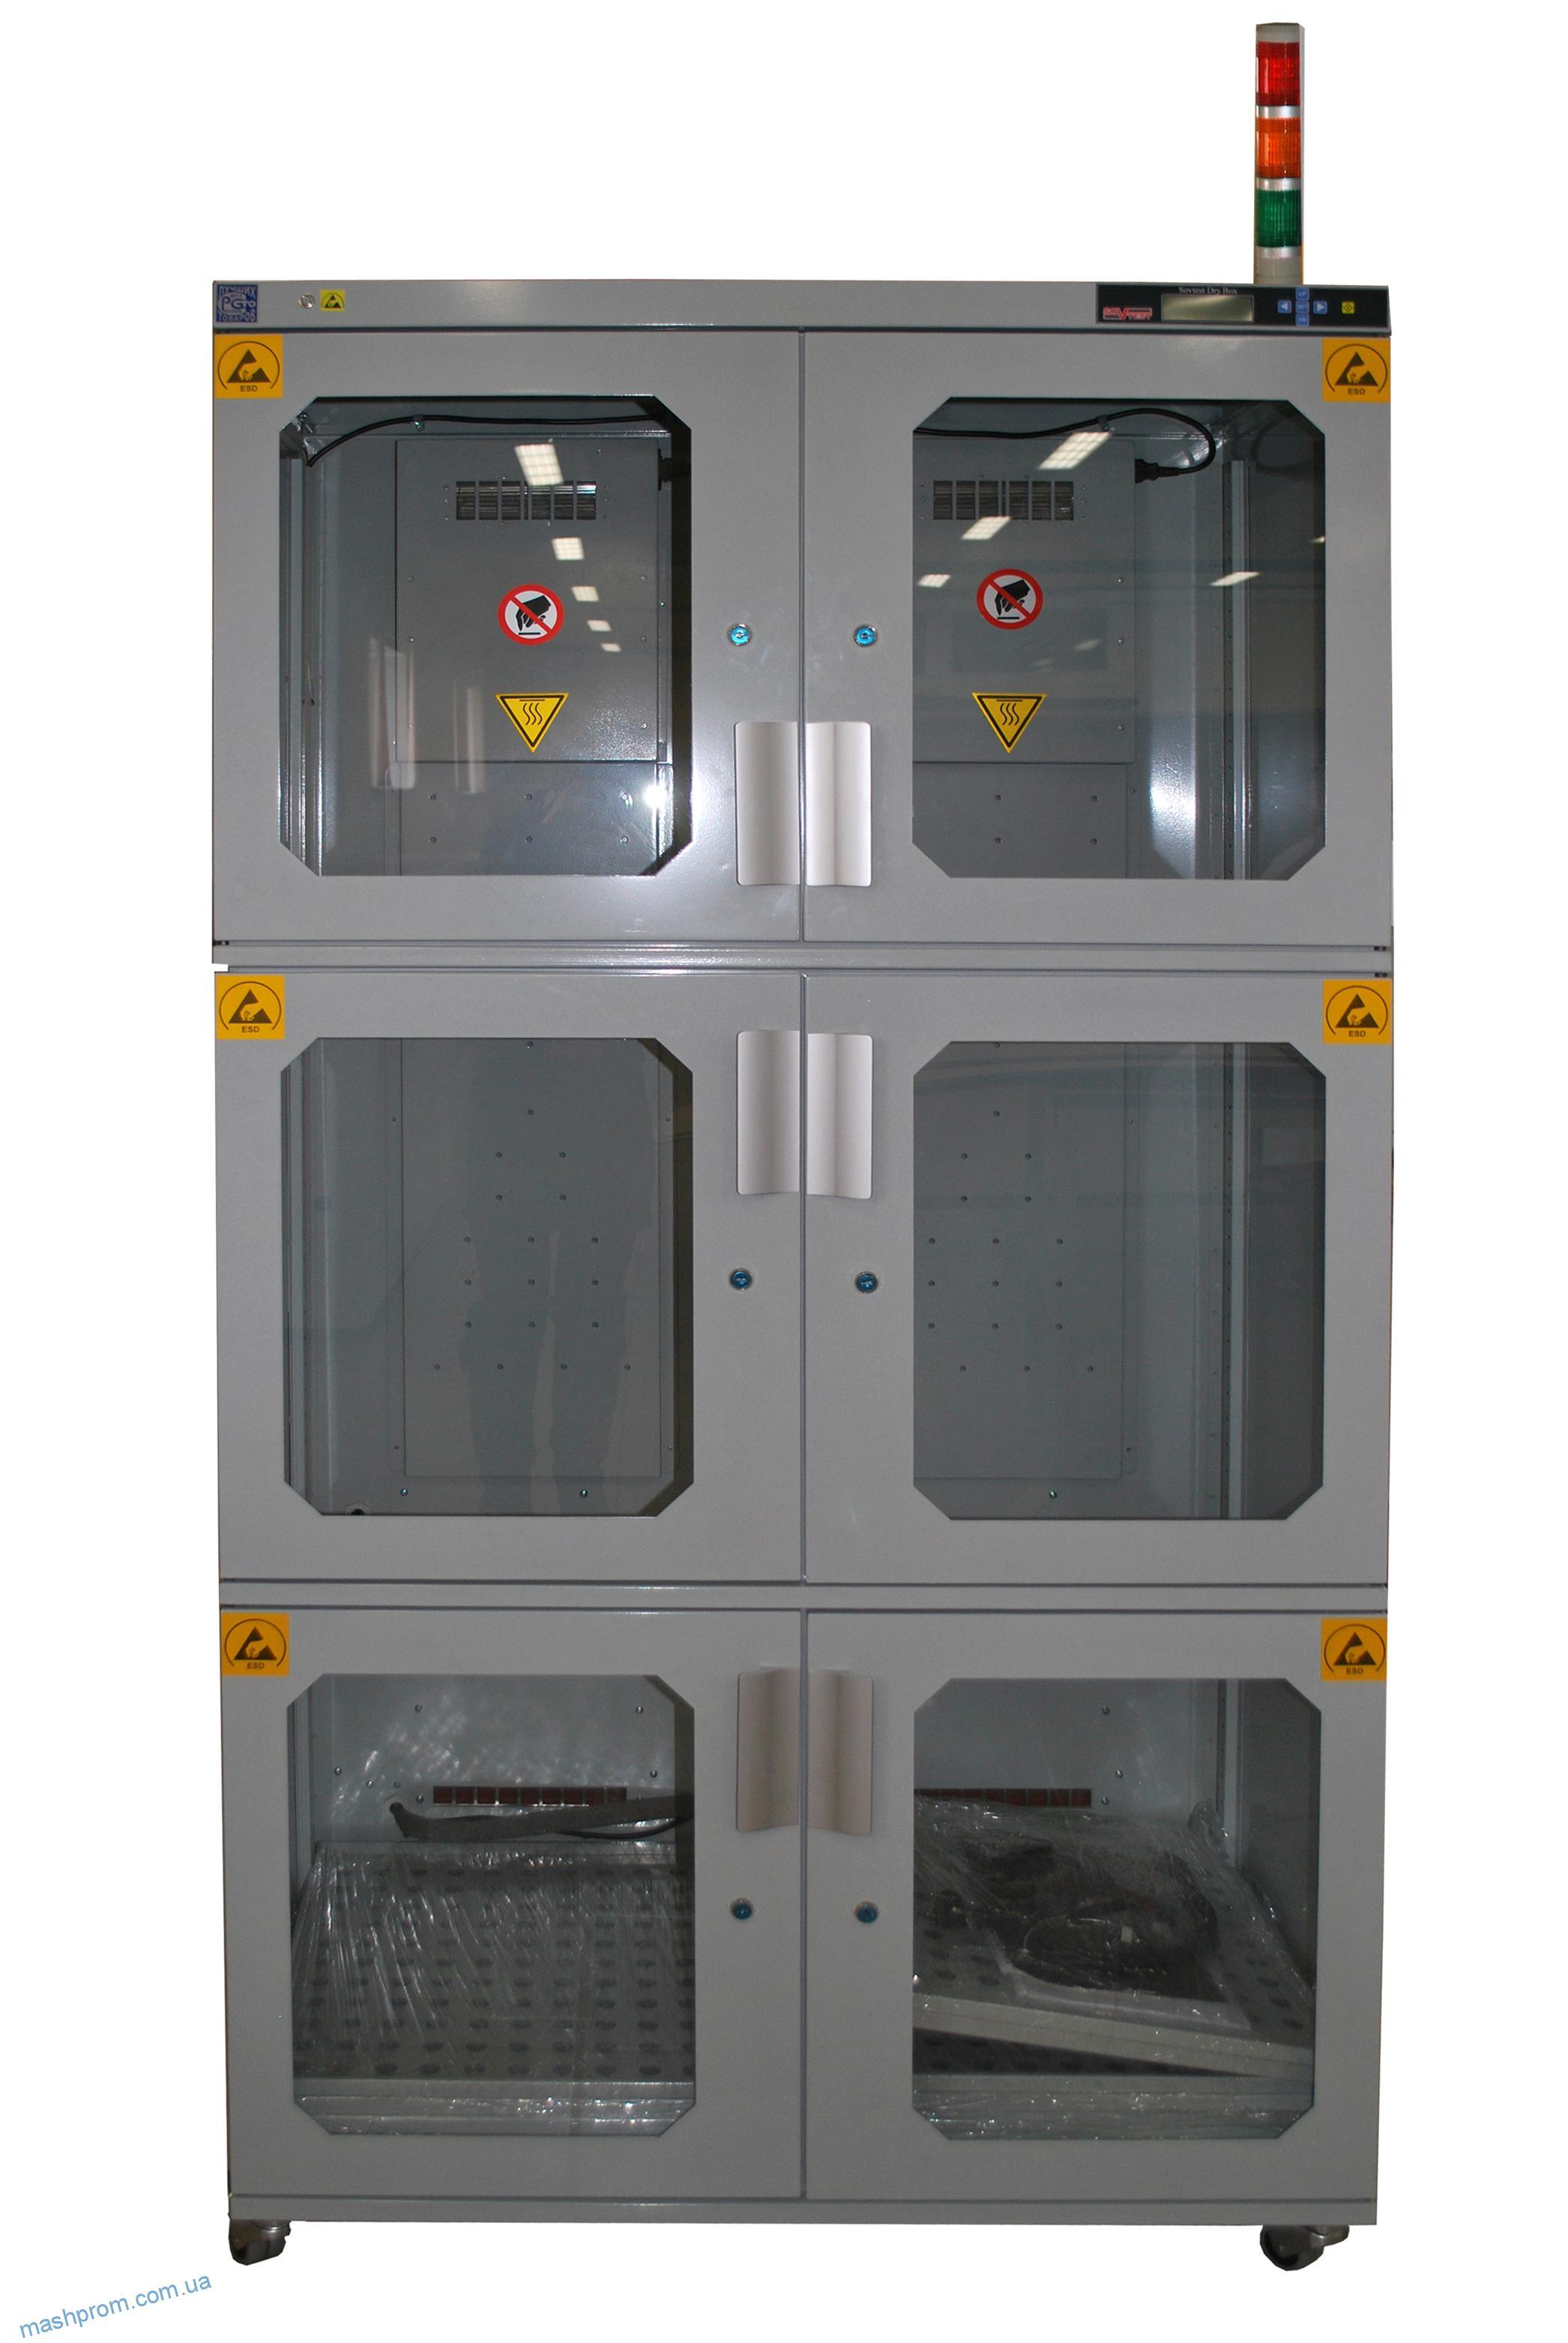 Шкаф сухого хранения SDB1106 ДИ с функцией автоматизации